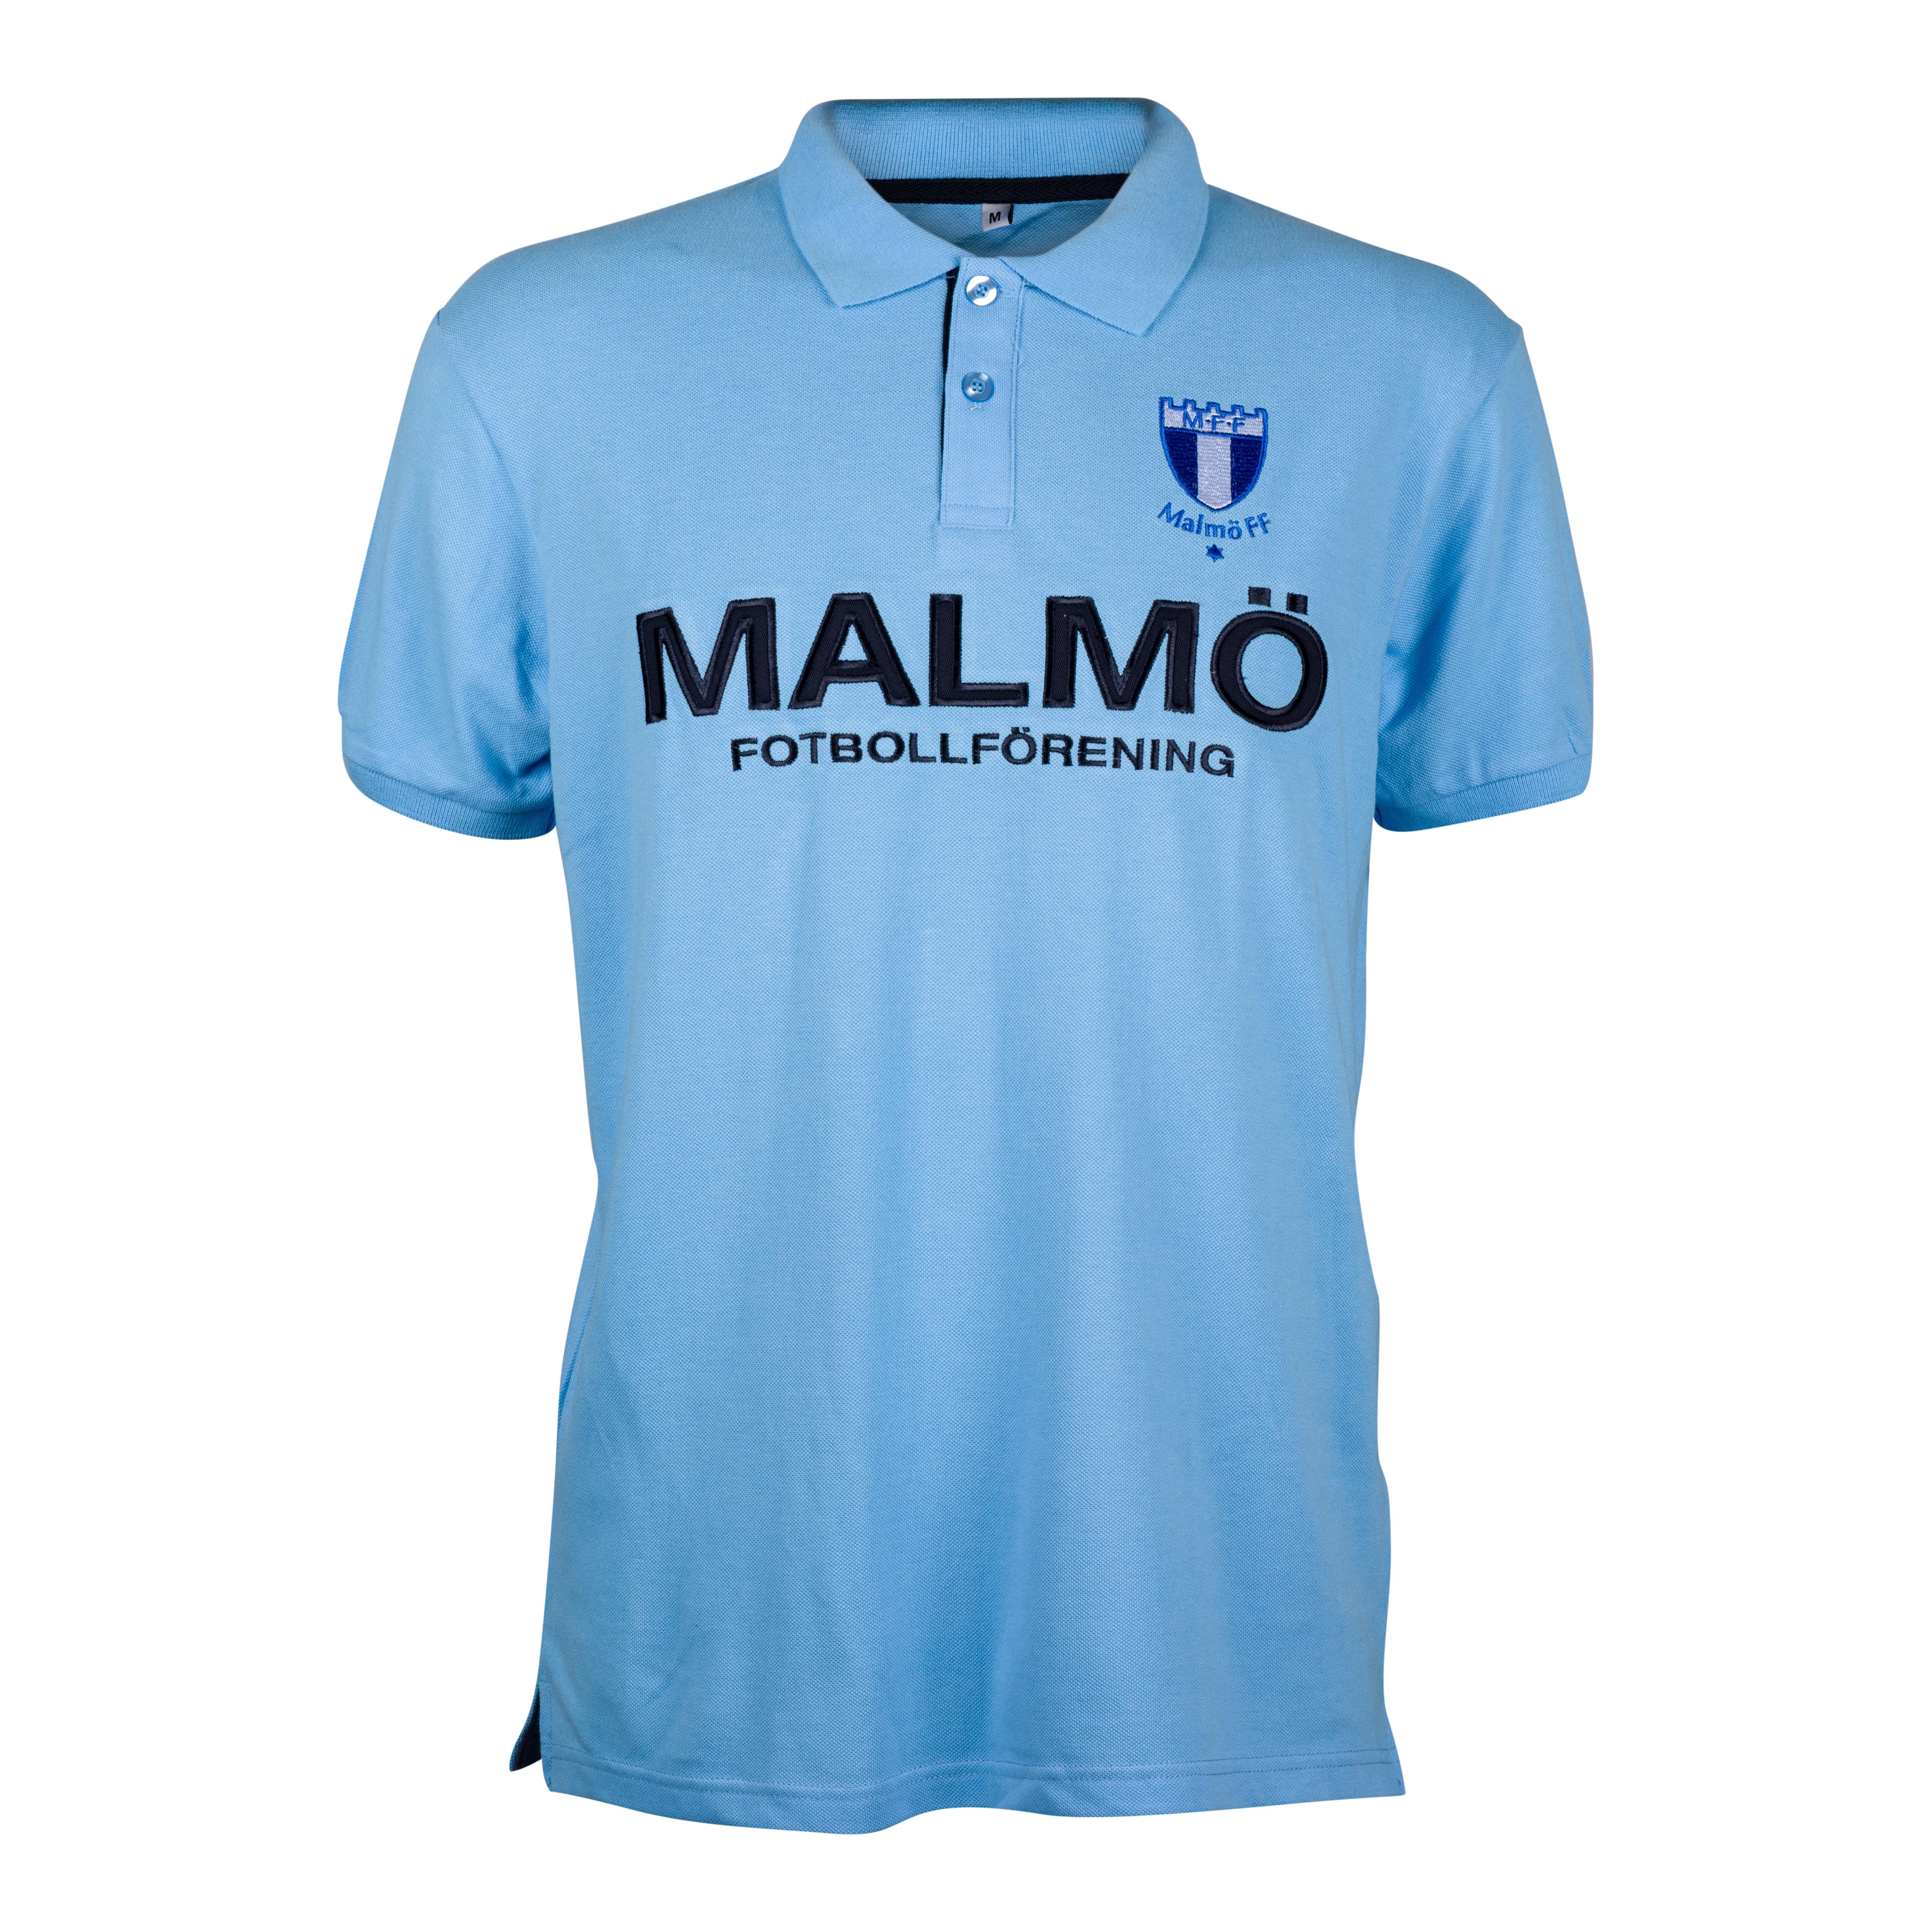 Pike Malmö ljusblå